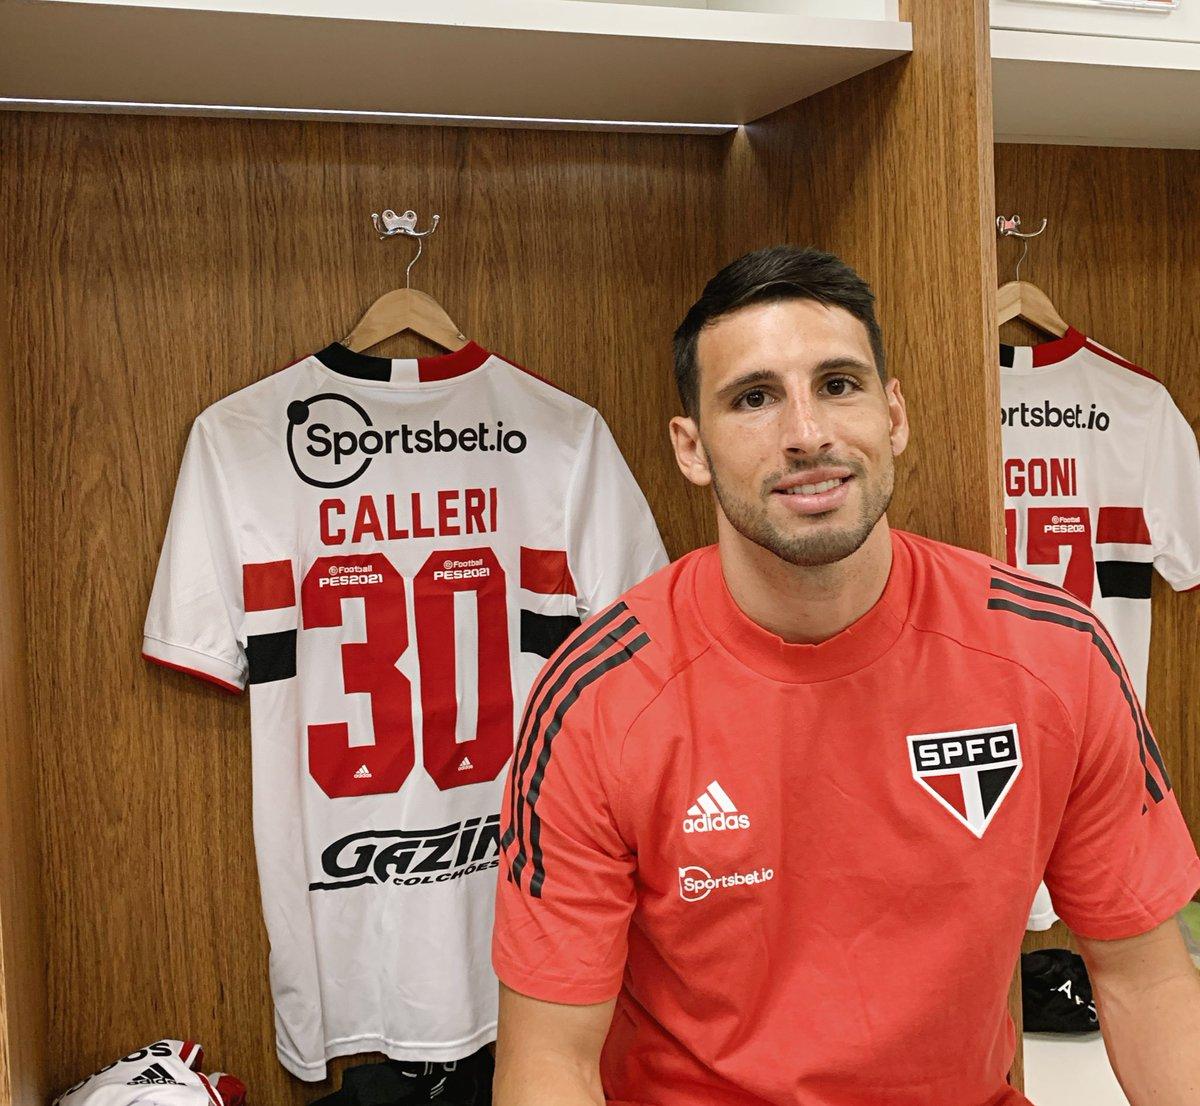 Camisa 30 é a dele @Jocalleri 🔛 #MorumbiENM